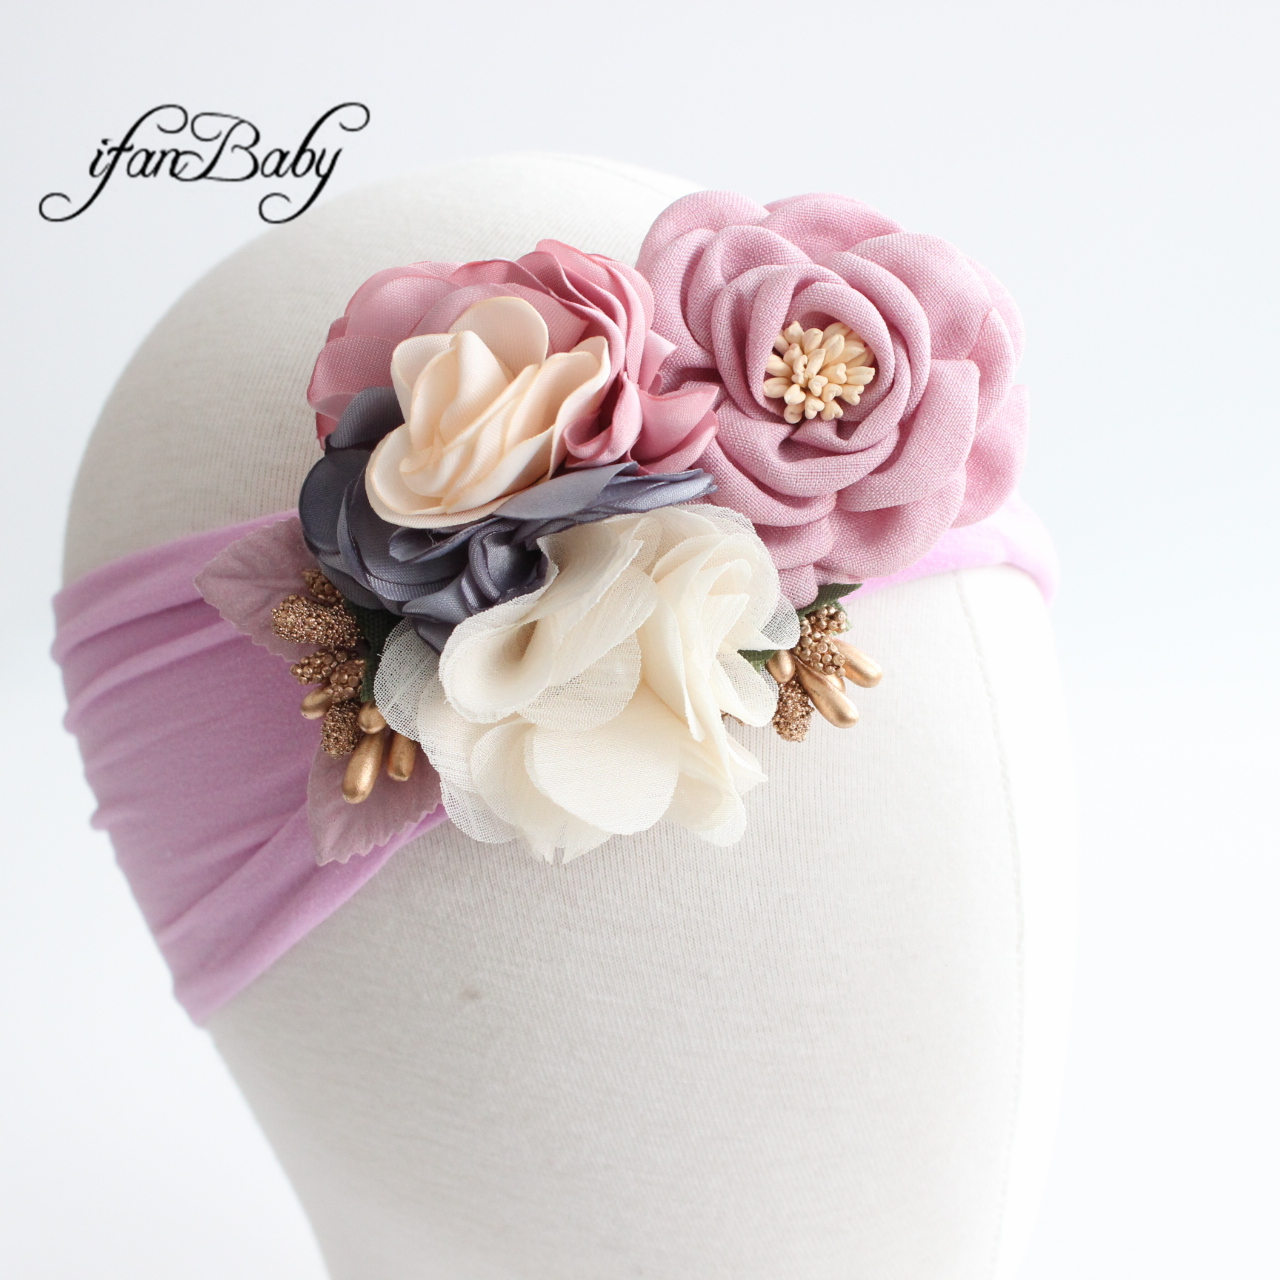 Fashion Turban Fabric Flower Headband Kids Girl Hair Accessories Nylon Soft Headwear